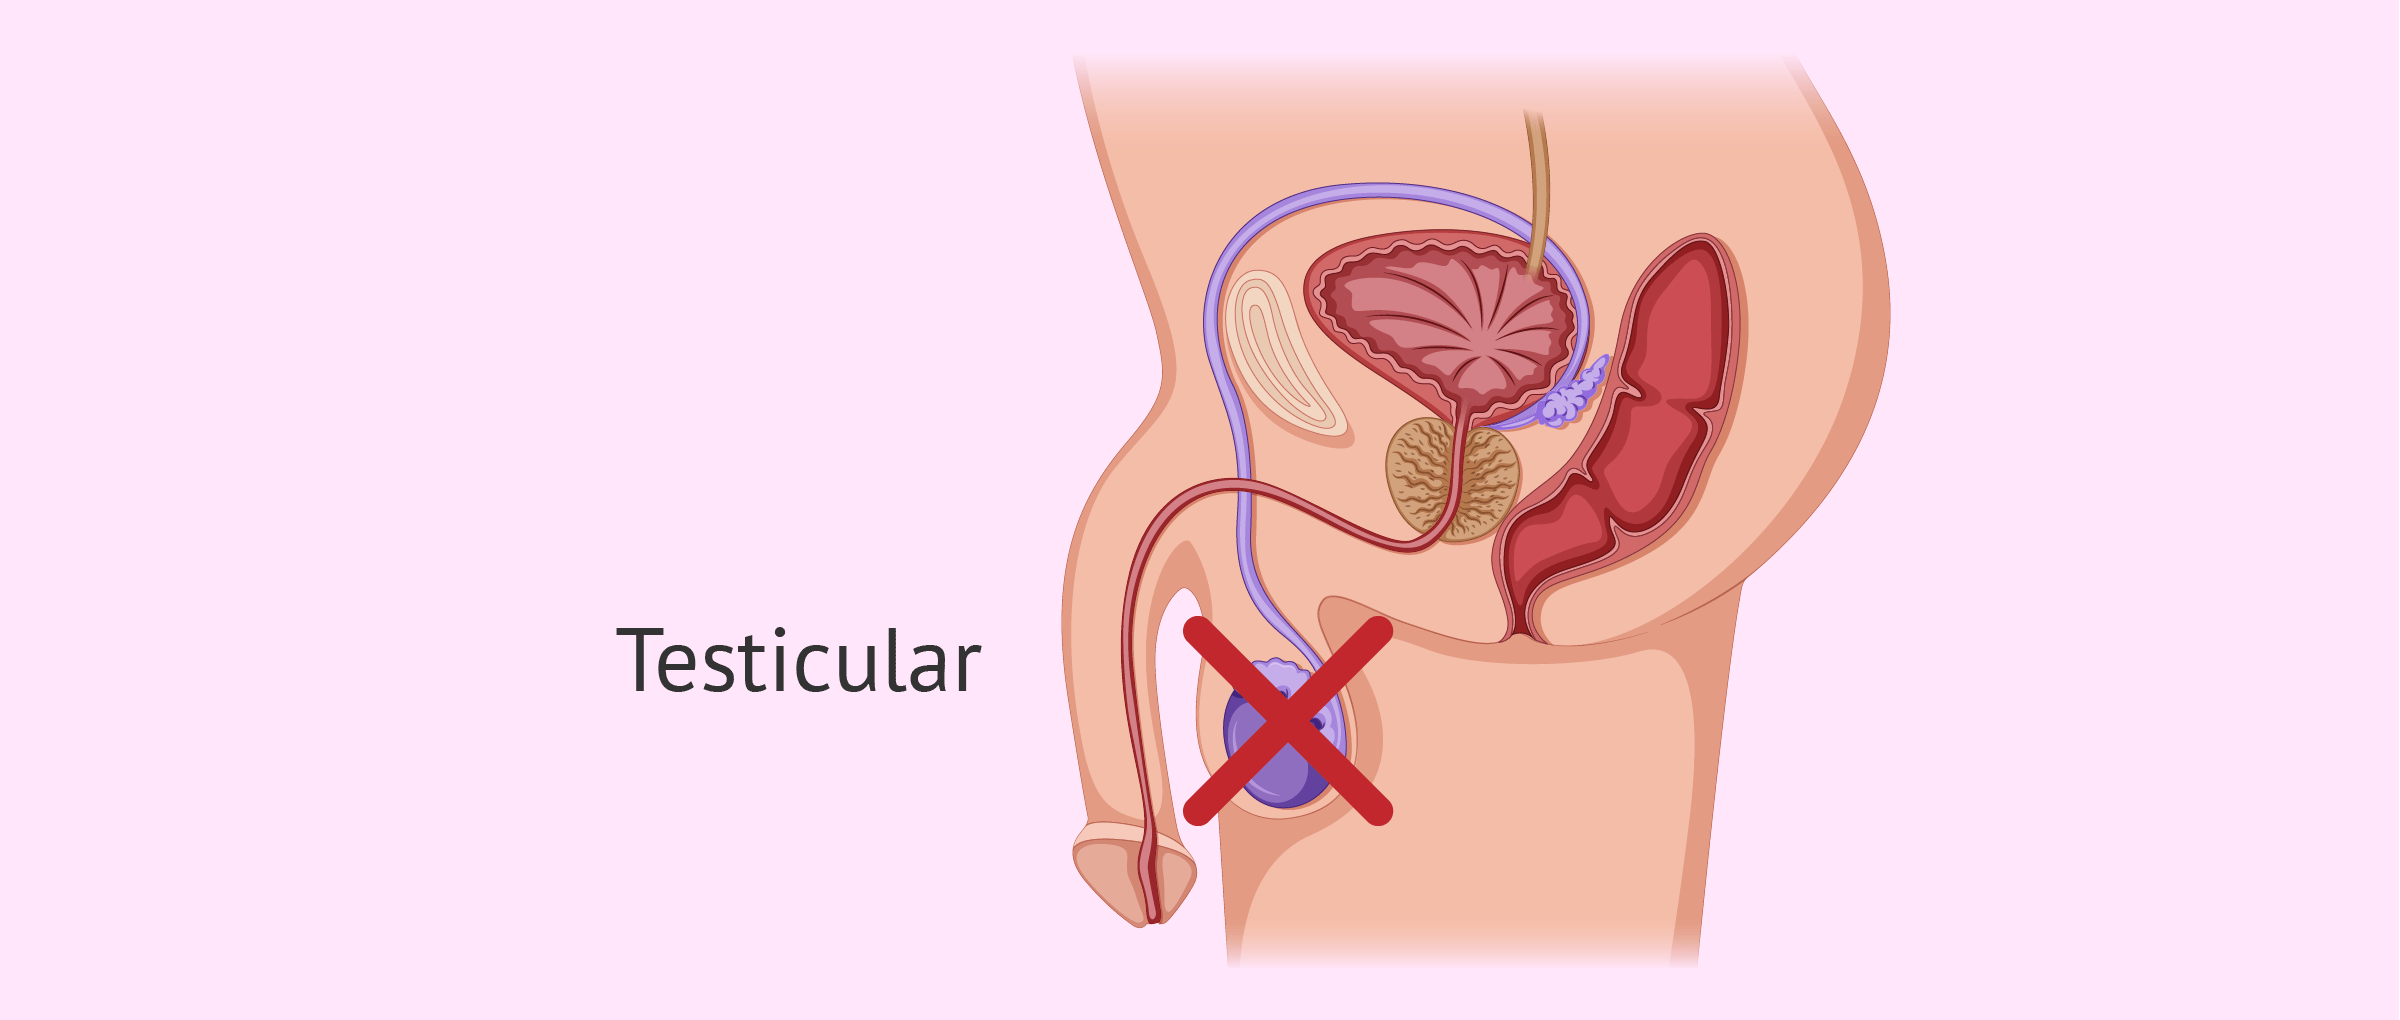 Testicular causes of azoospermia